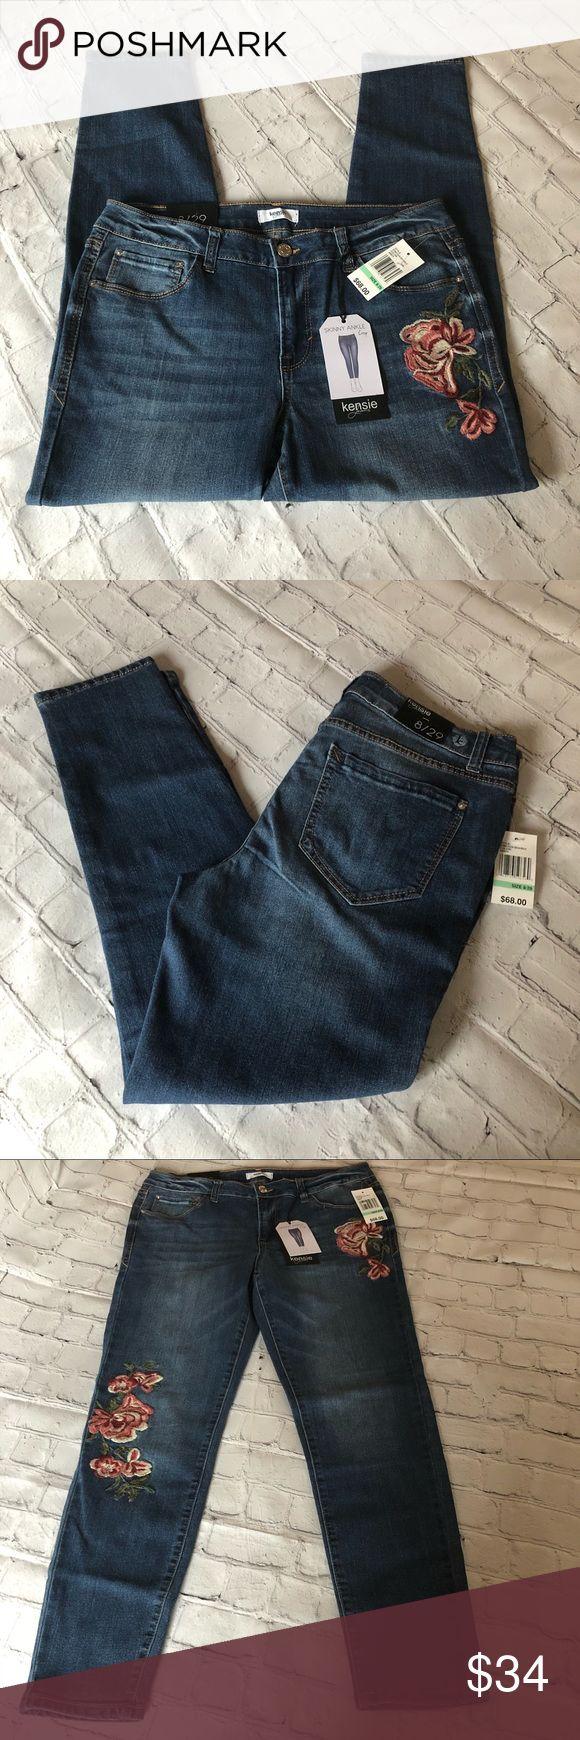 NEW Kensie Jeans Embroidered Skinny Ankle Jeans 8 NWT Kensie Jeans Stretchy Floral Embroidered Skinny  Size 8/29 measurements in pictures Kensie Pants Skinny